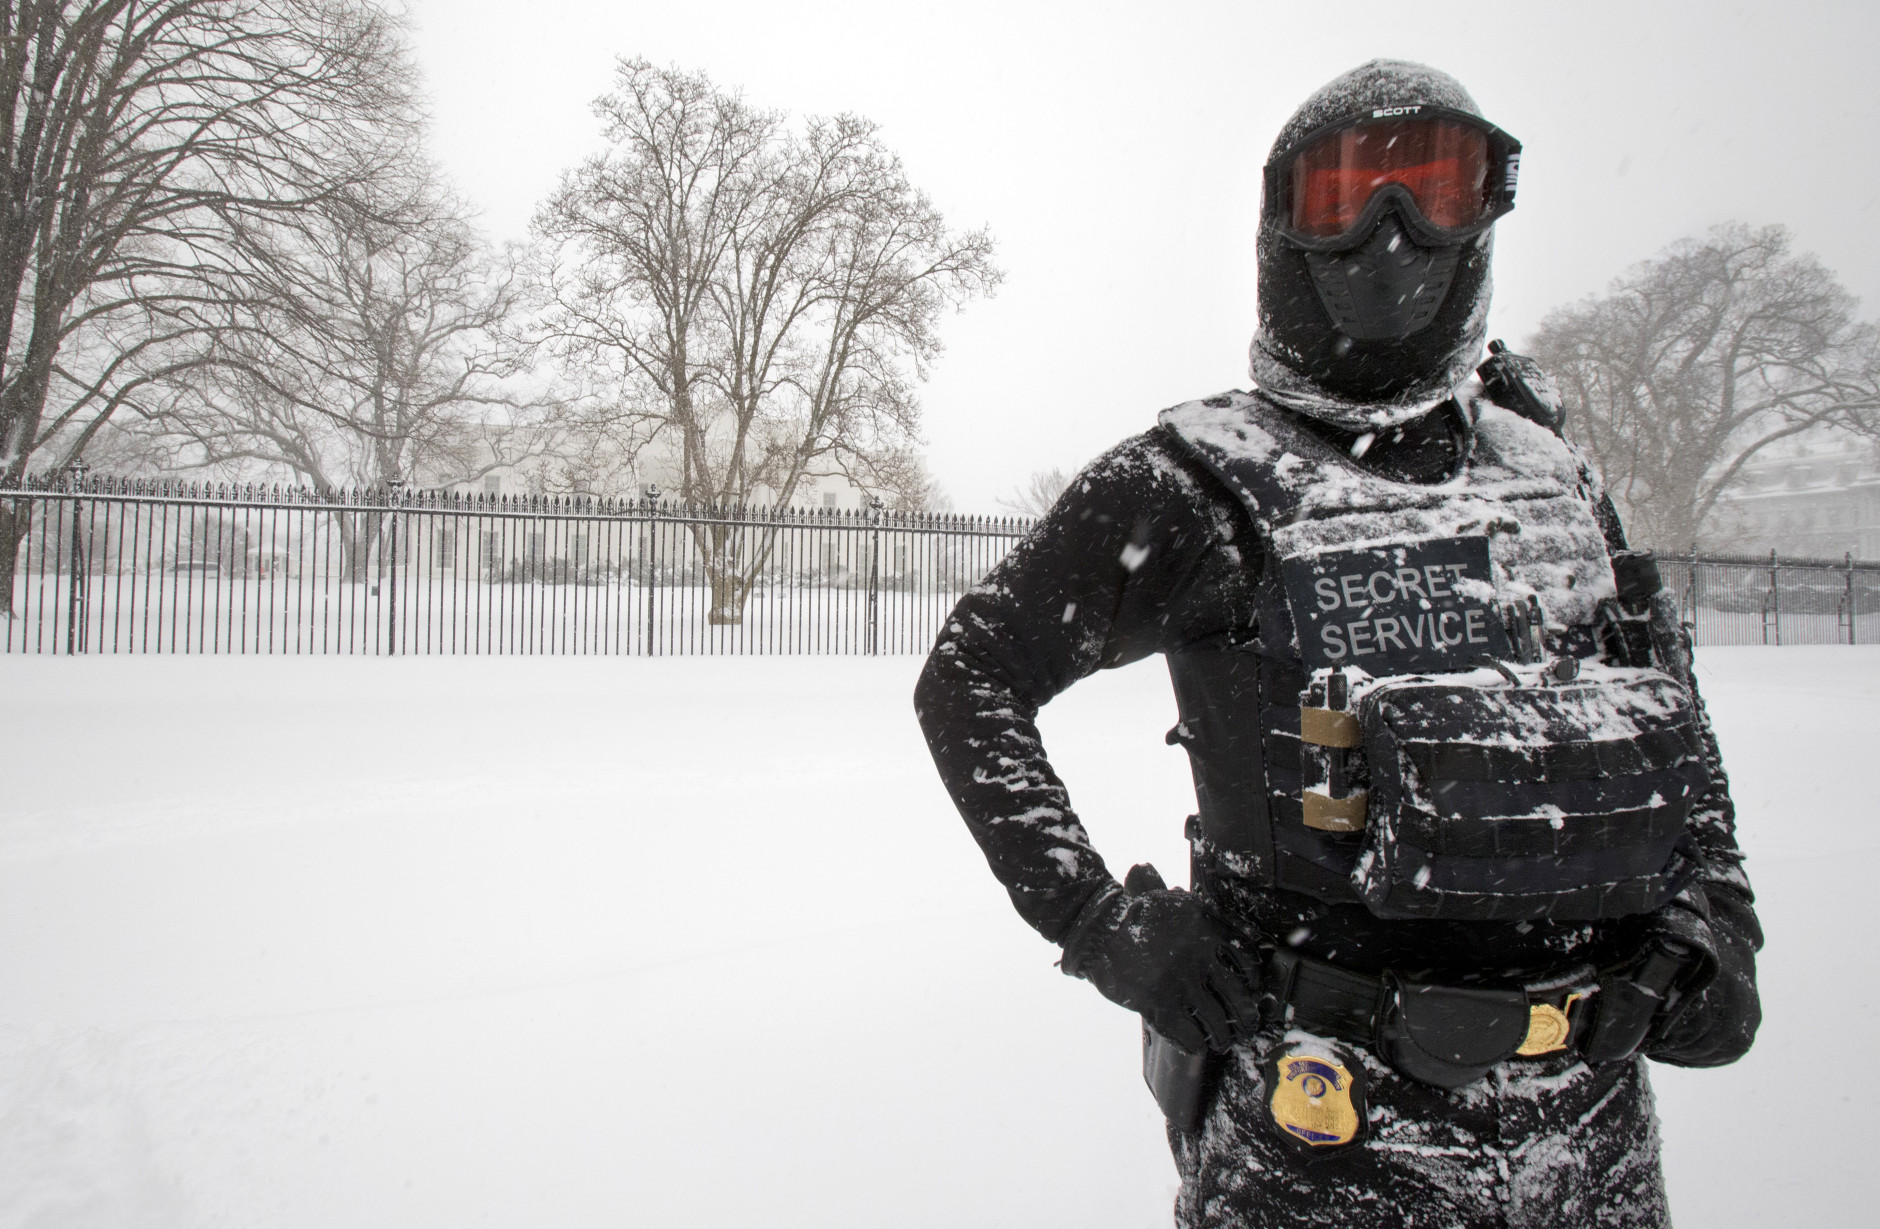 A uniformed U.S. Secret Service police officer stands guard in a knee-deep snow outside the White House in Washington, Saturday, Jan. 23, 2016.   (AP Photo/Manuel Balce Ceneta)